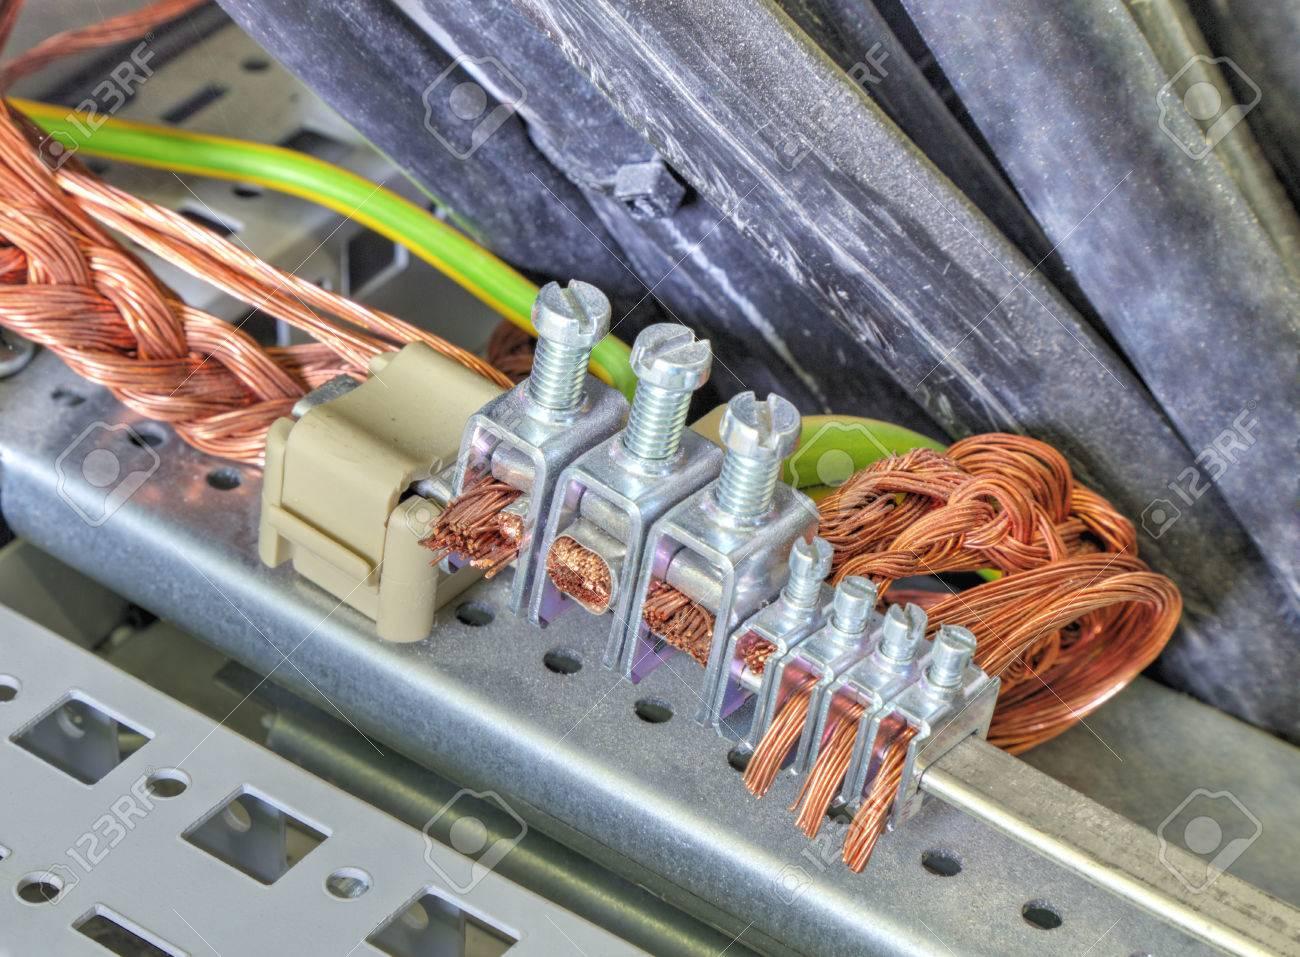 Charmant Glühwürmteile 30cxi Ideen - Schaltplan Serie Circuit ...